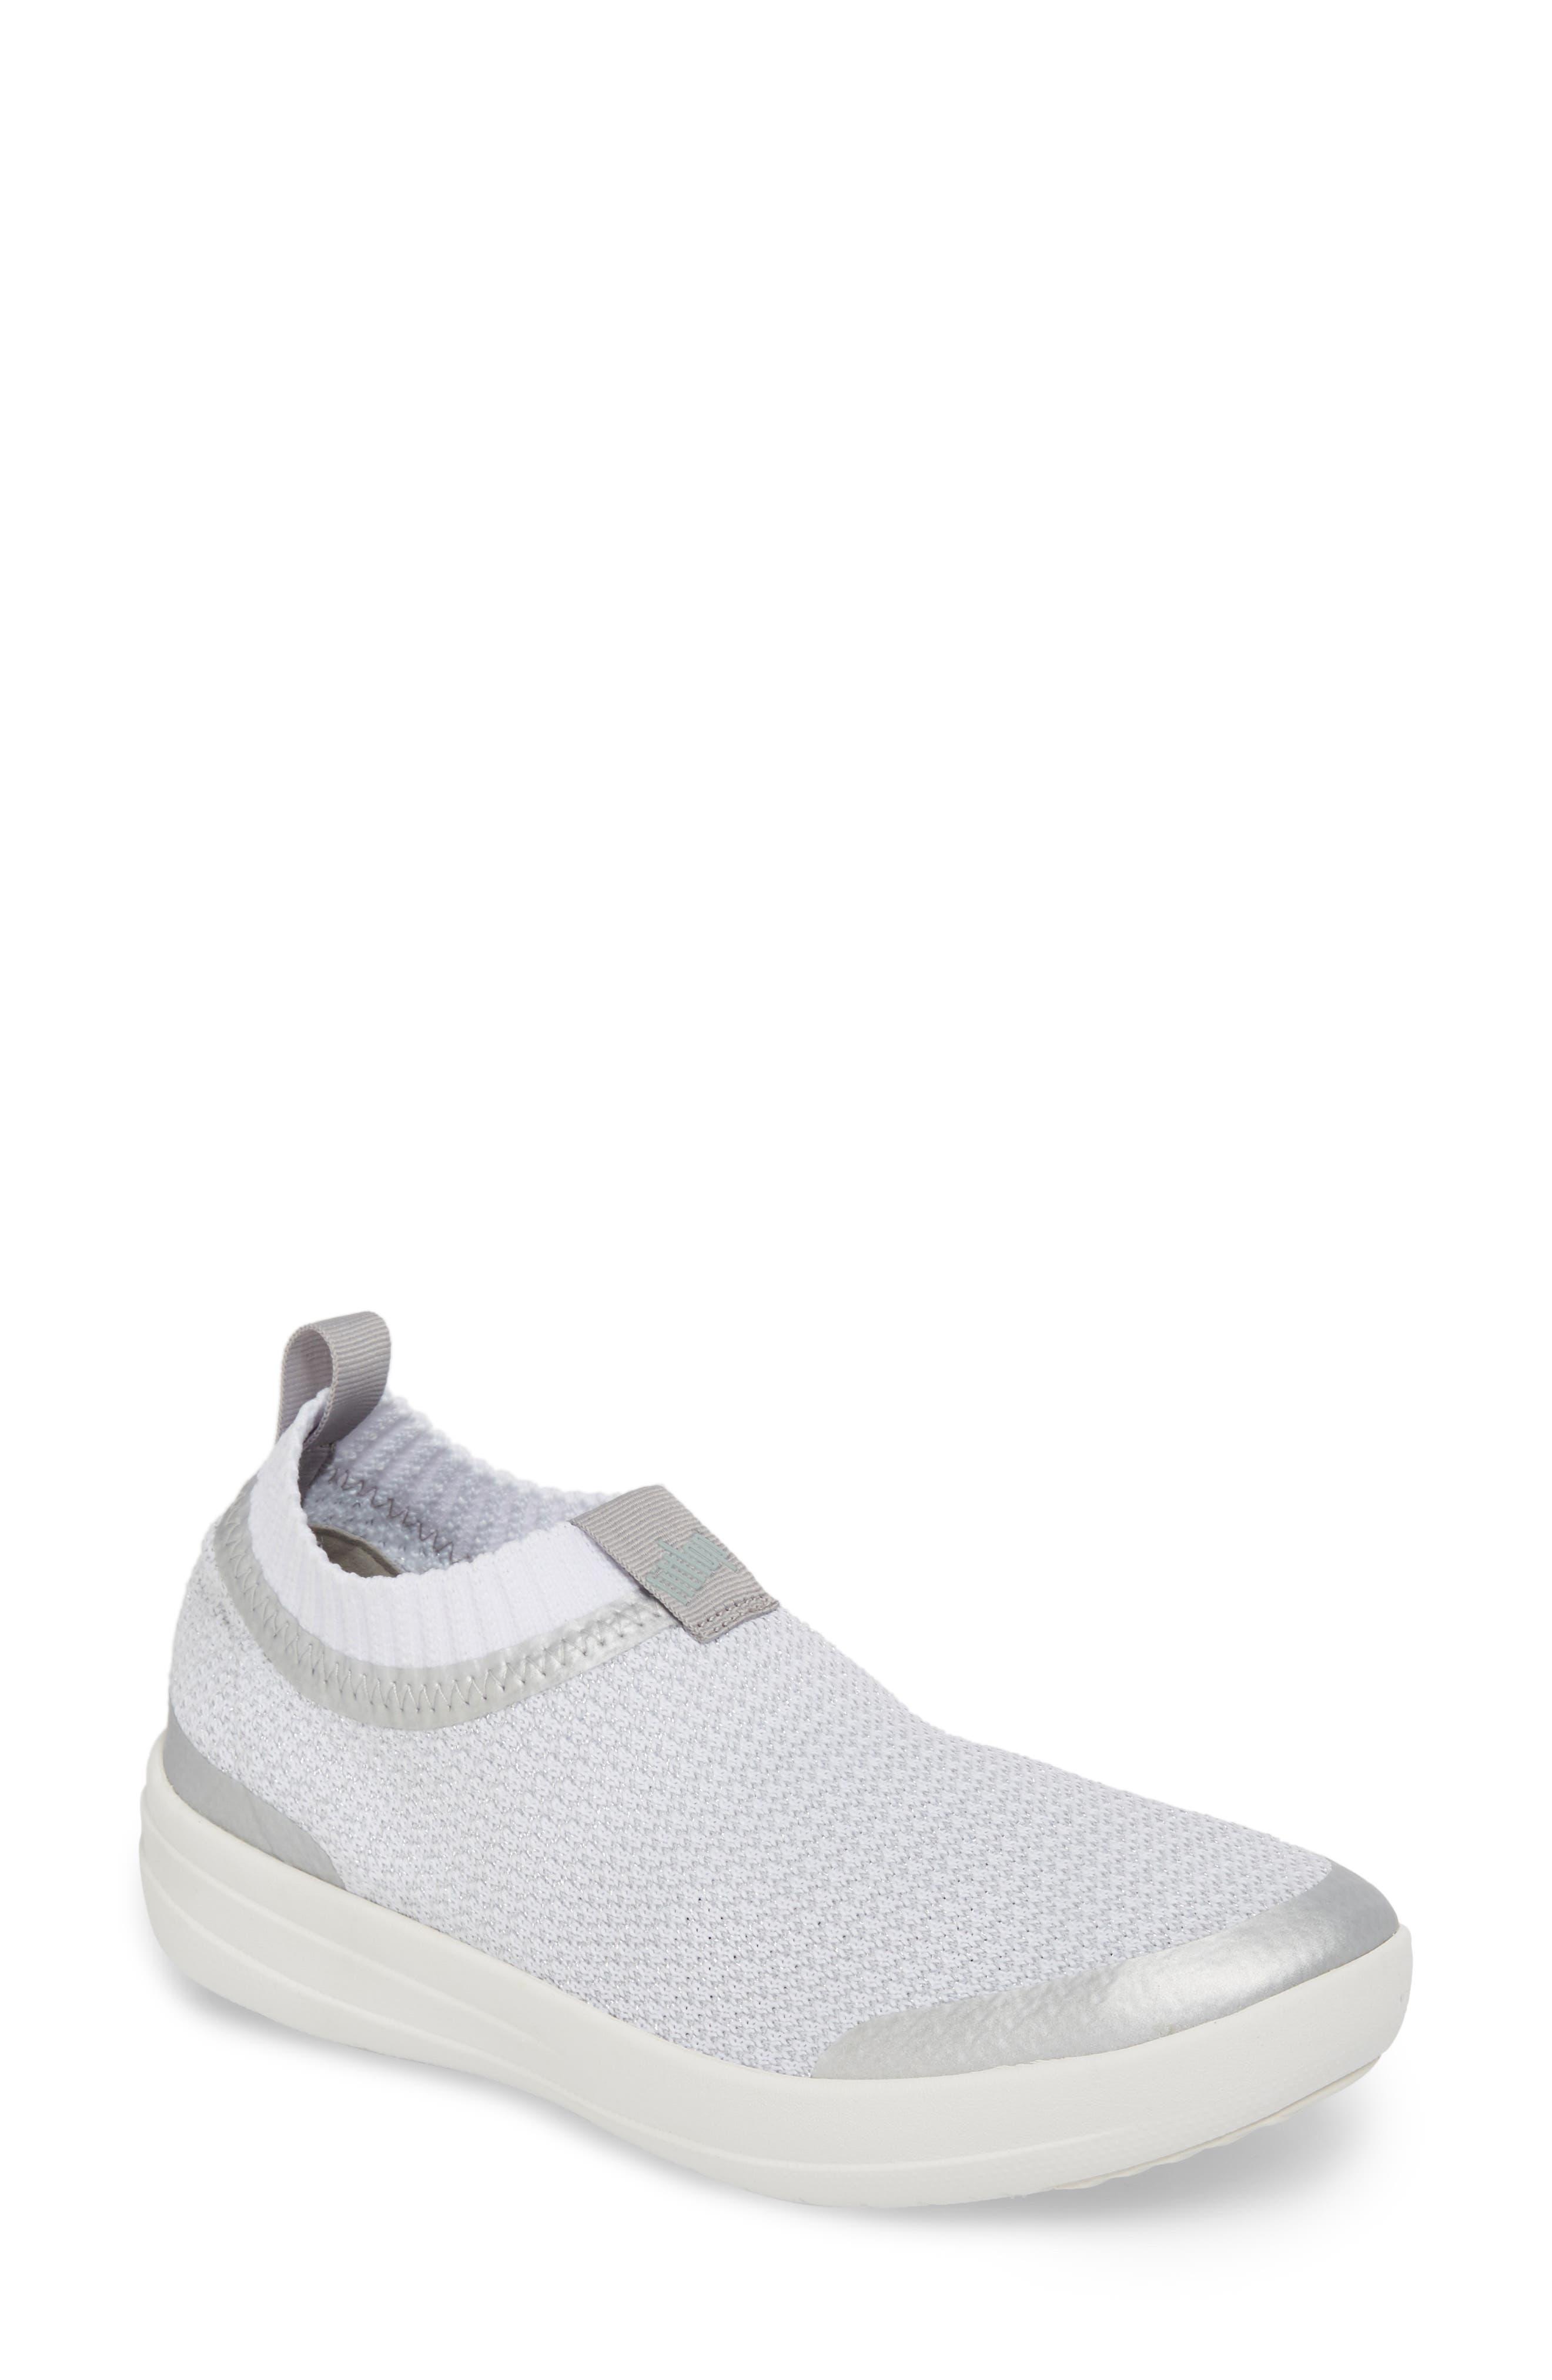 Uberknit Knit Sock Sneaker,                         Main,                         color, 040